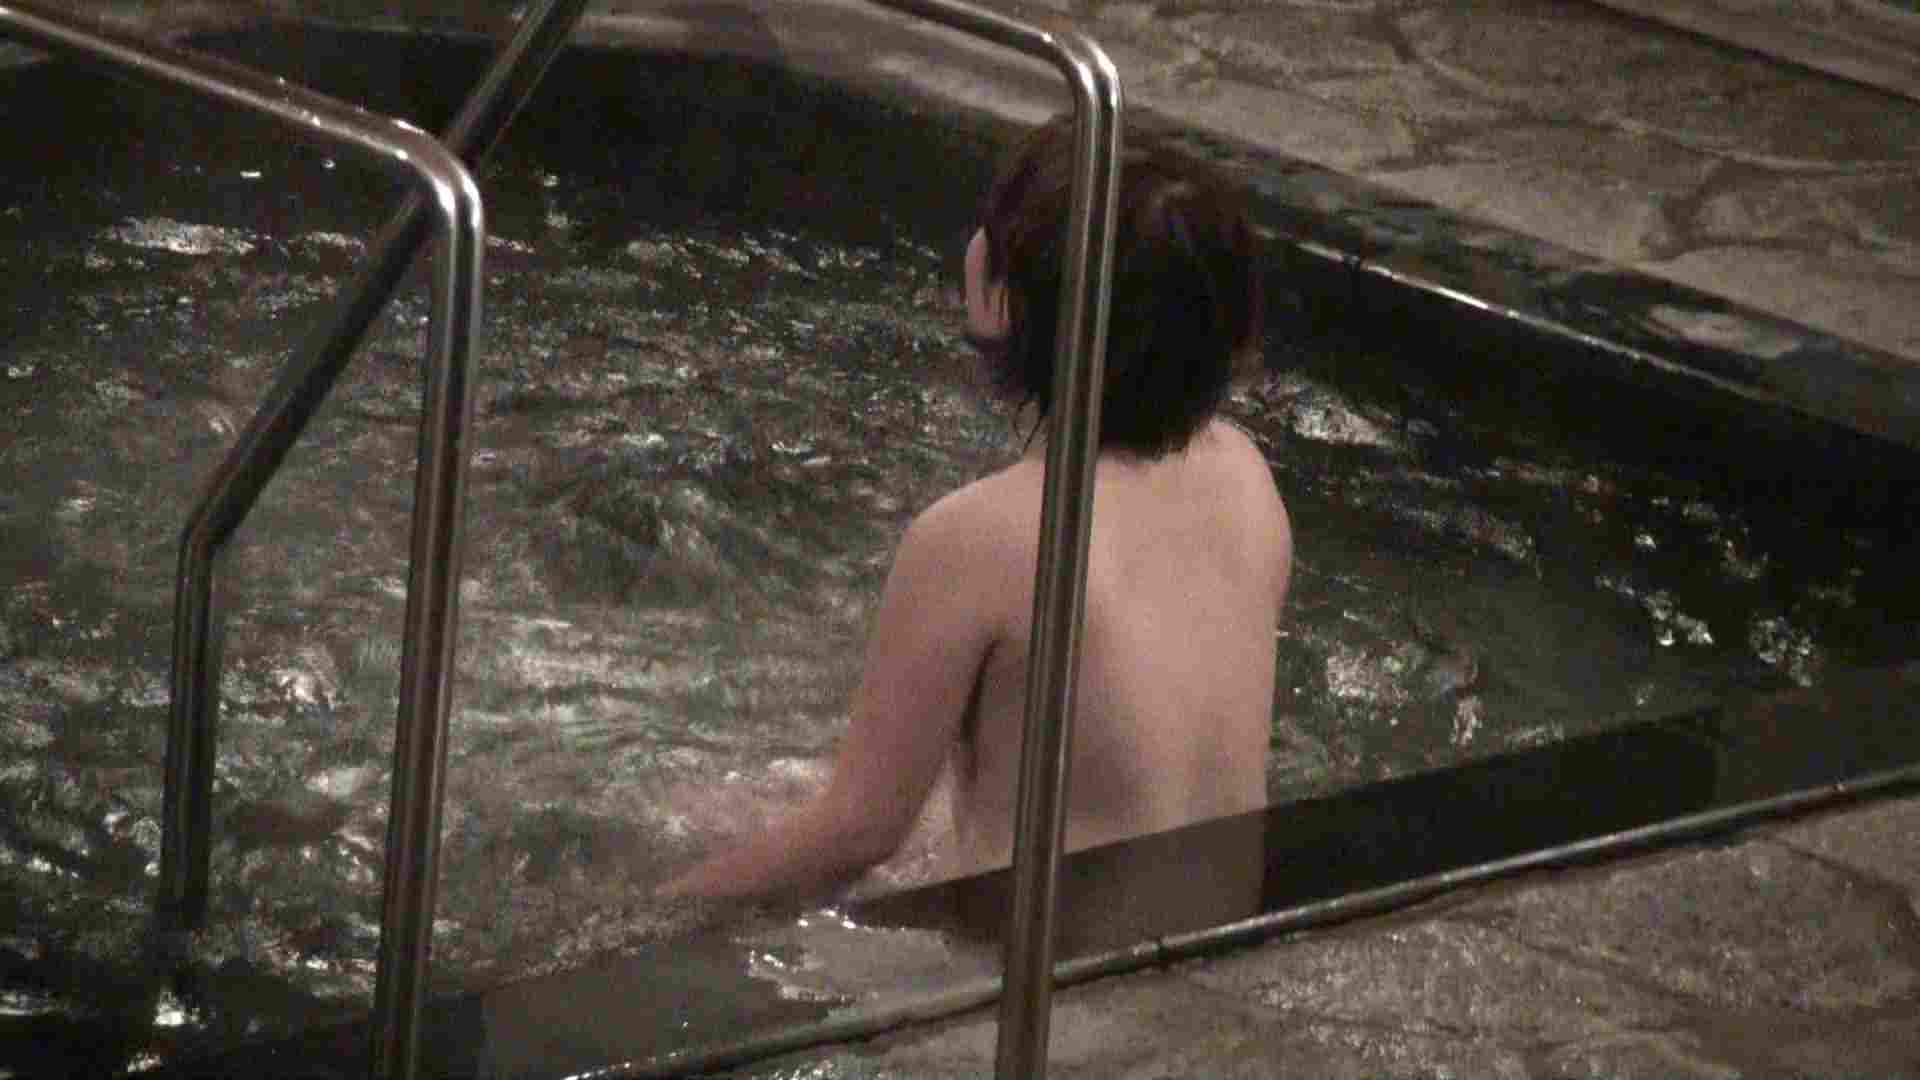 Aquaな露天風呂Vol.432 盗撮   OLエロ画像  86PICs 46